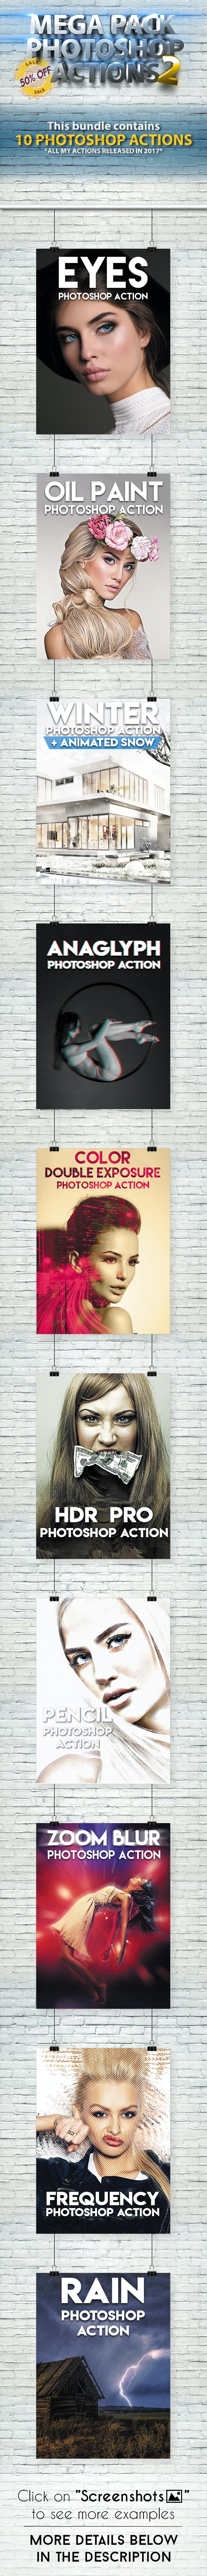 Mega Pack 2 Photoshop Actions Bundle - Photo Effects Actions